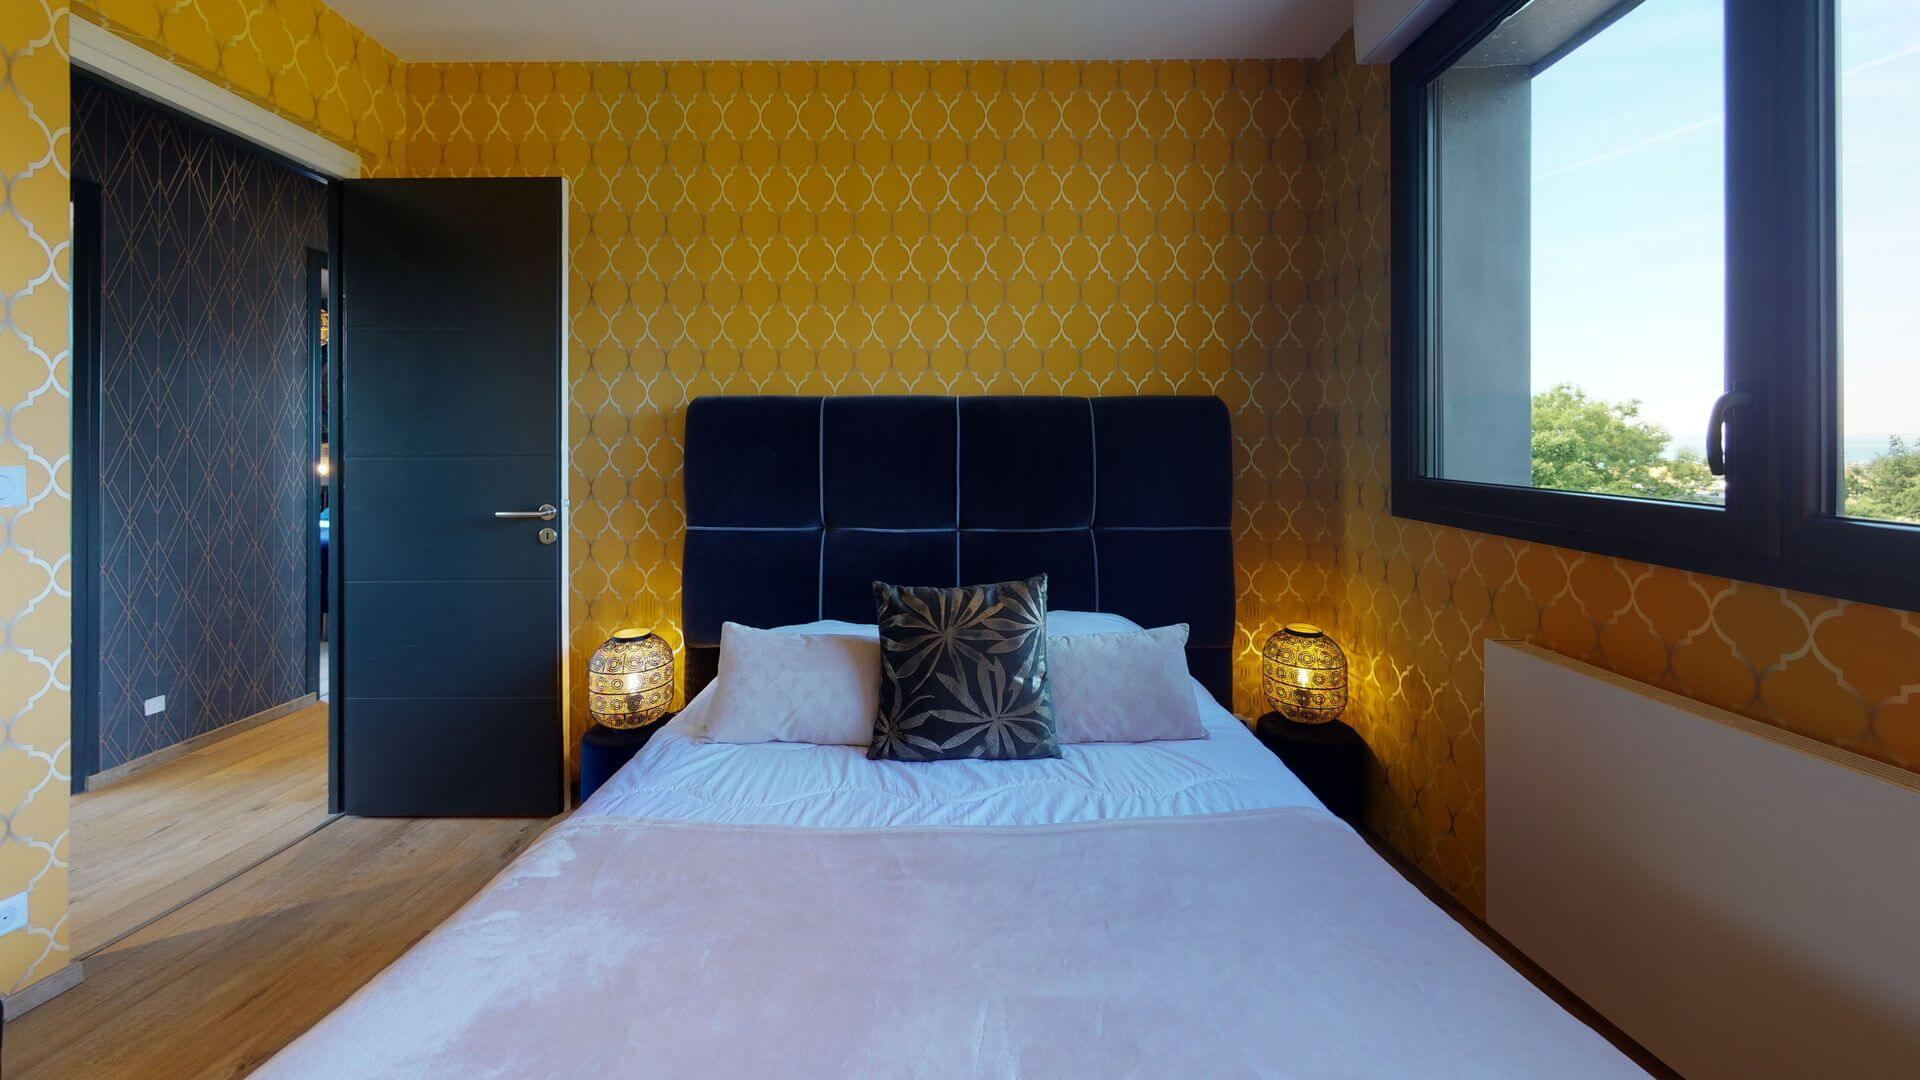 5 CHAMBRES & 2 SDB La Casa dAntoine par LA CLEF DECAMP Bedroom